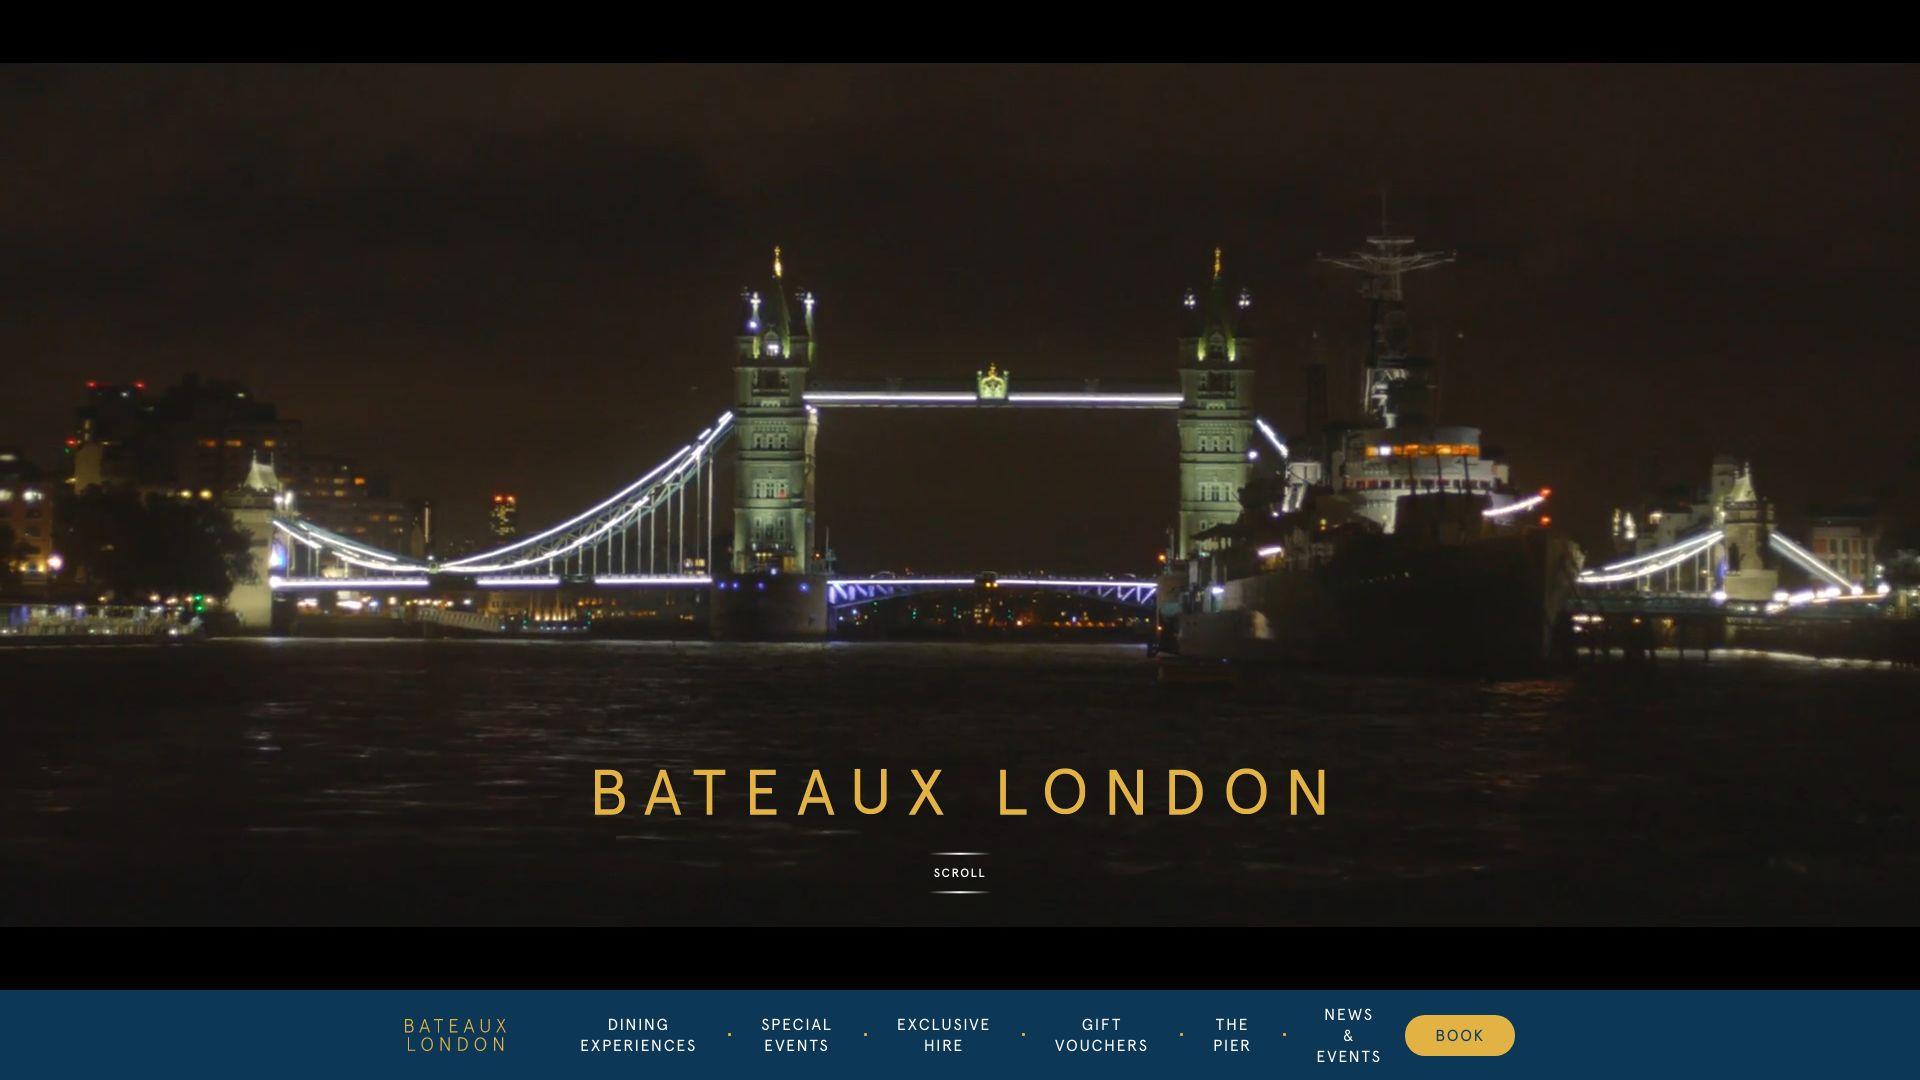 Bateaux London screenshot